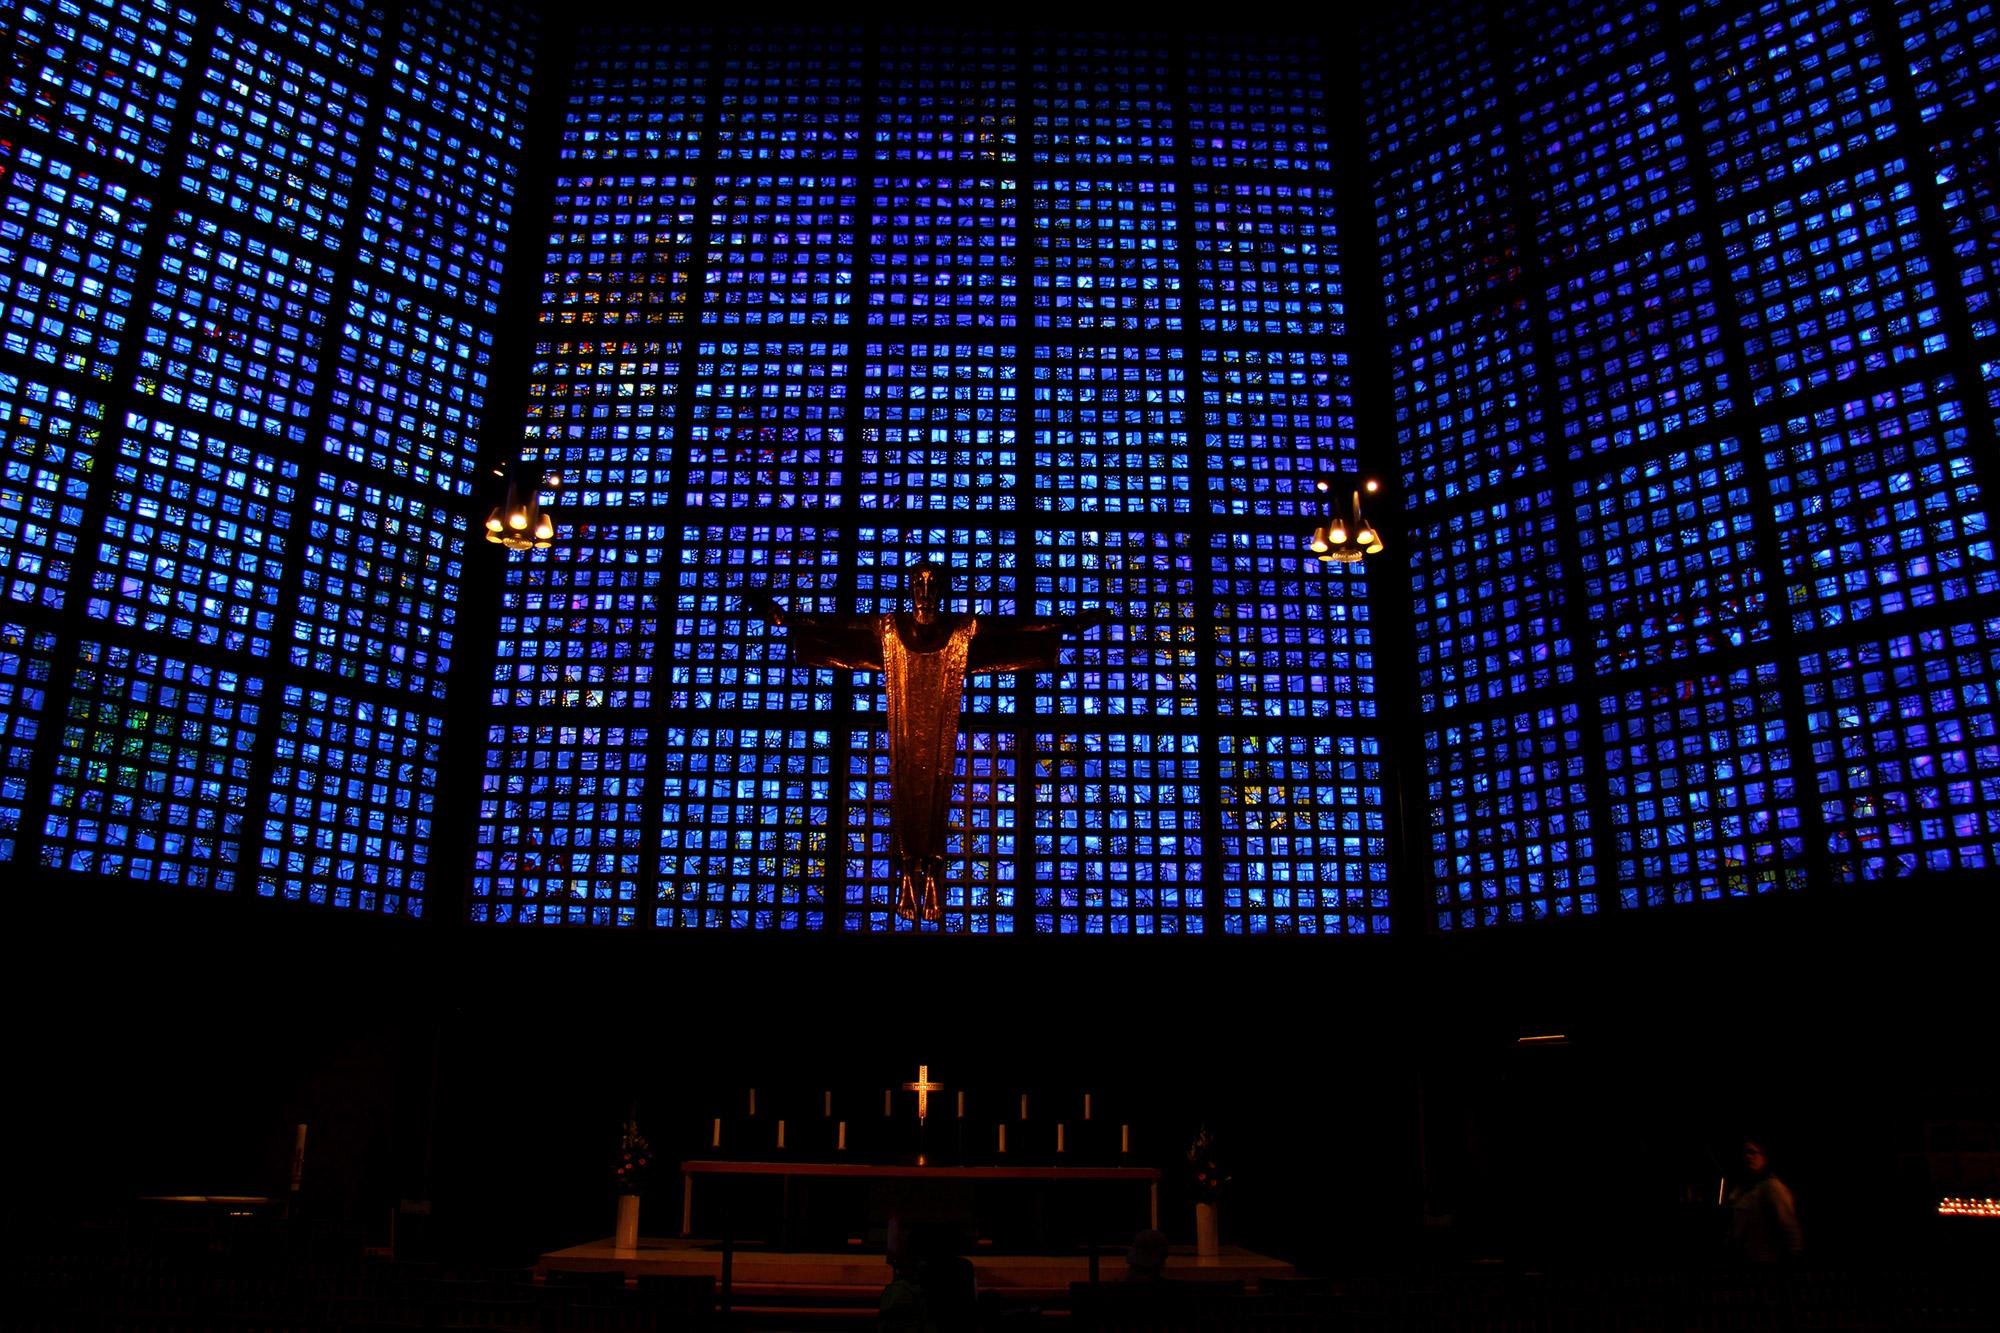 Blue Monday - De Gedächtniskirche in Berlijn